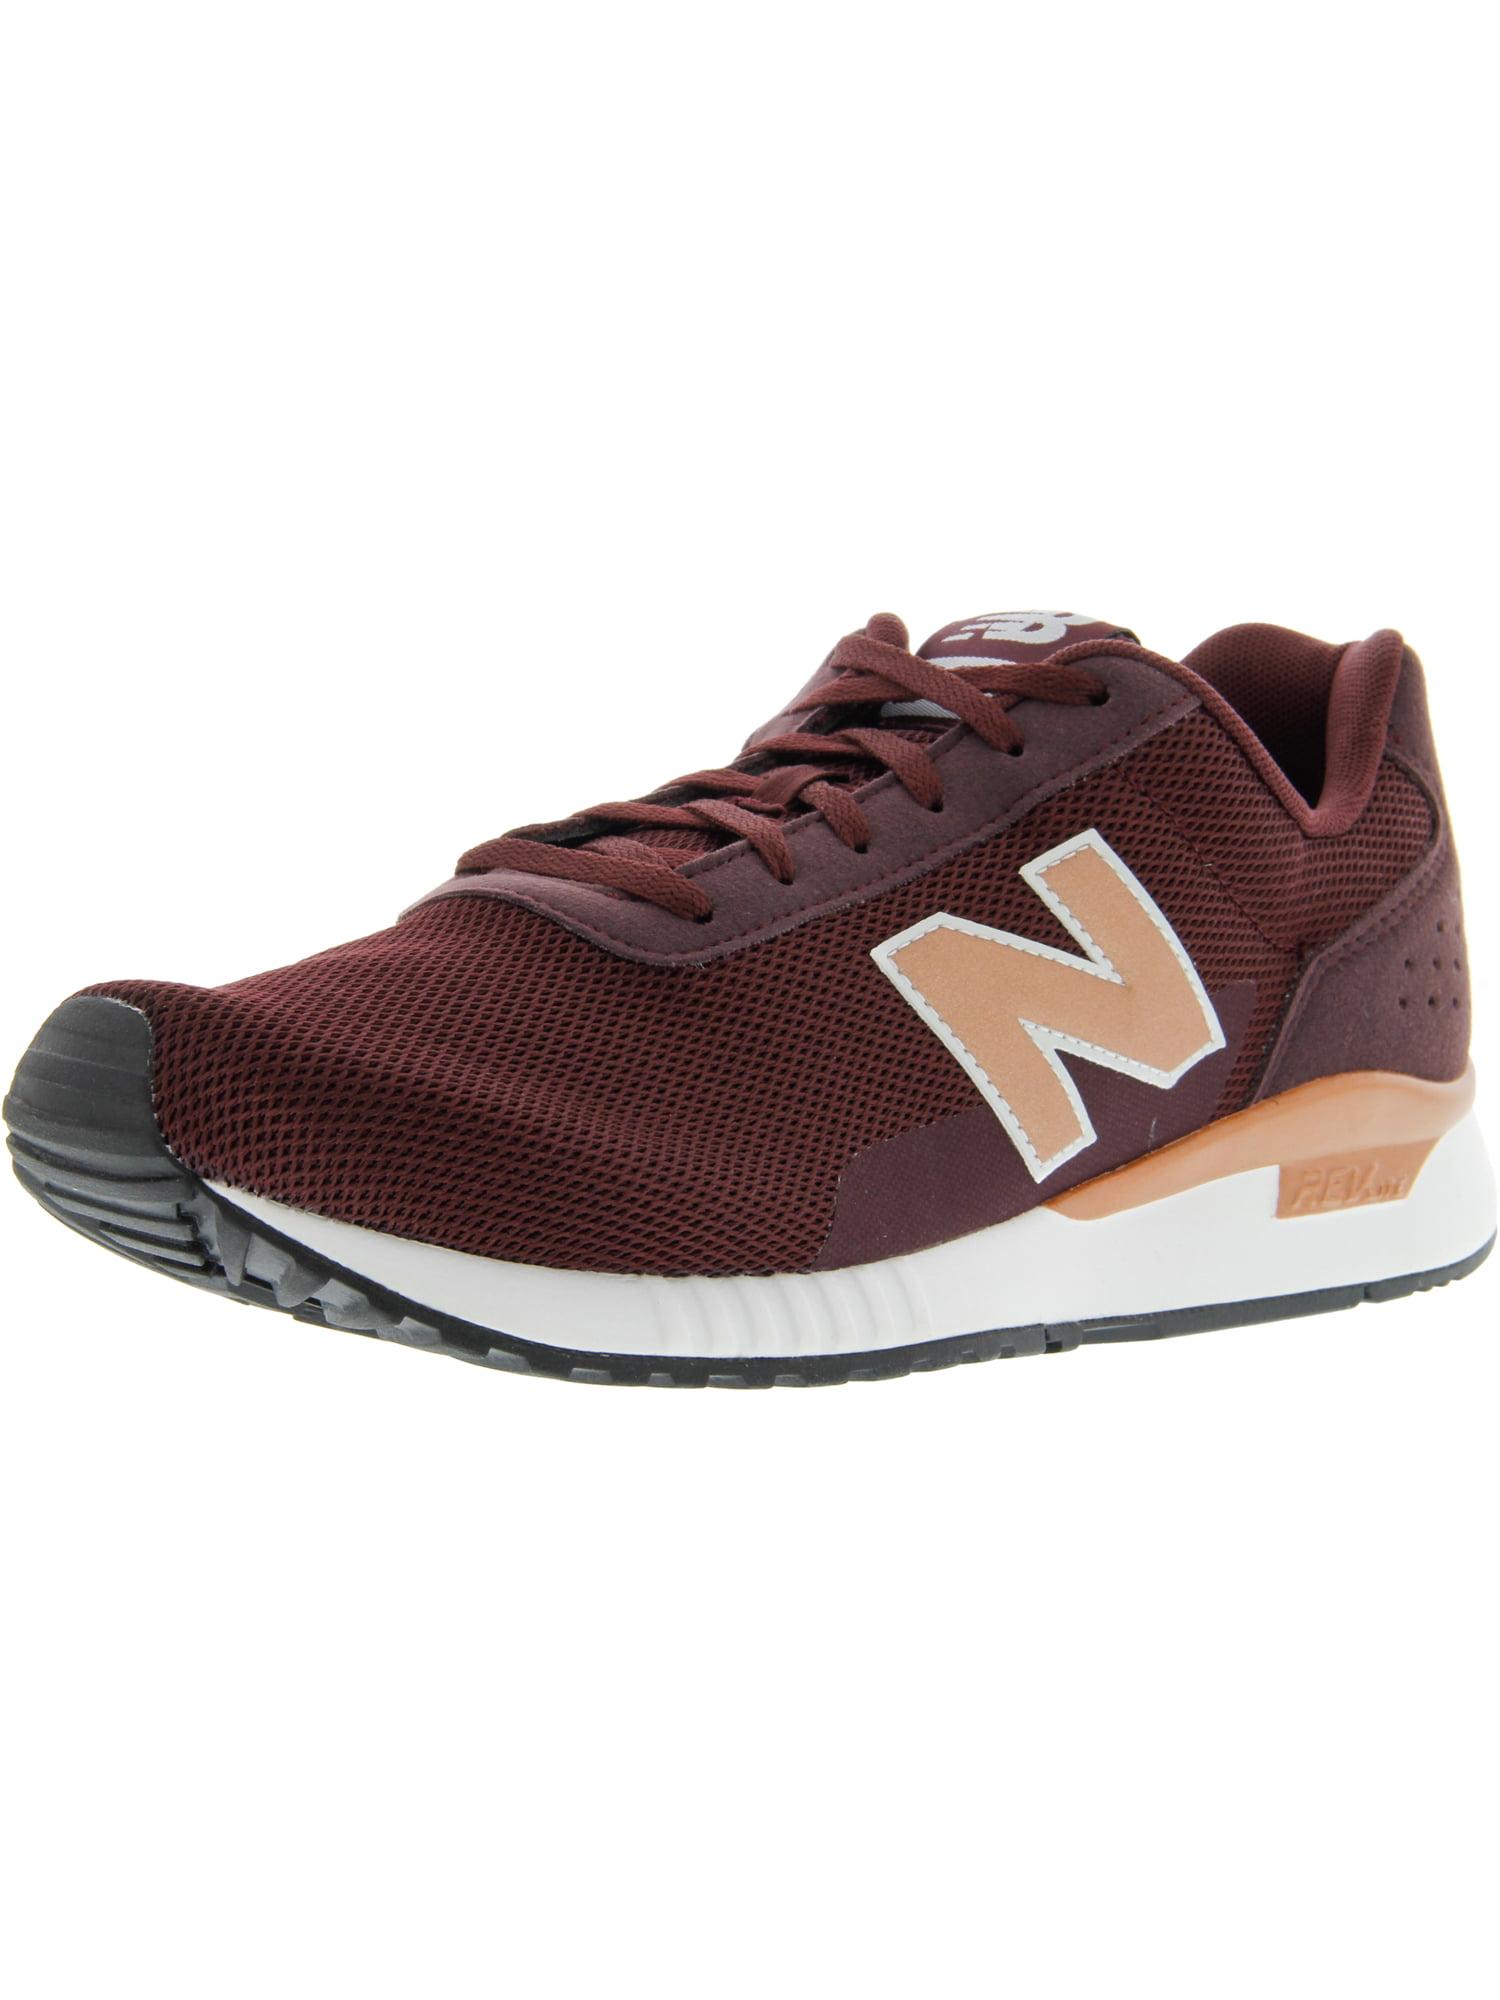 New Balance Women's Wrl005 Yd Running Shoe - 9.5M